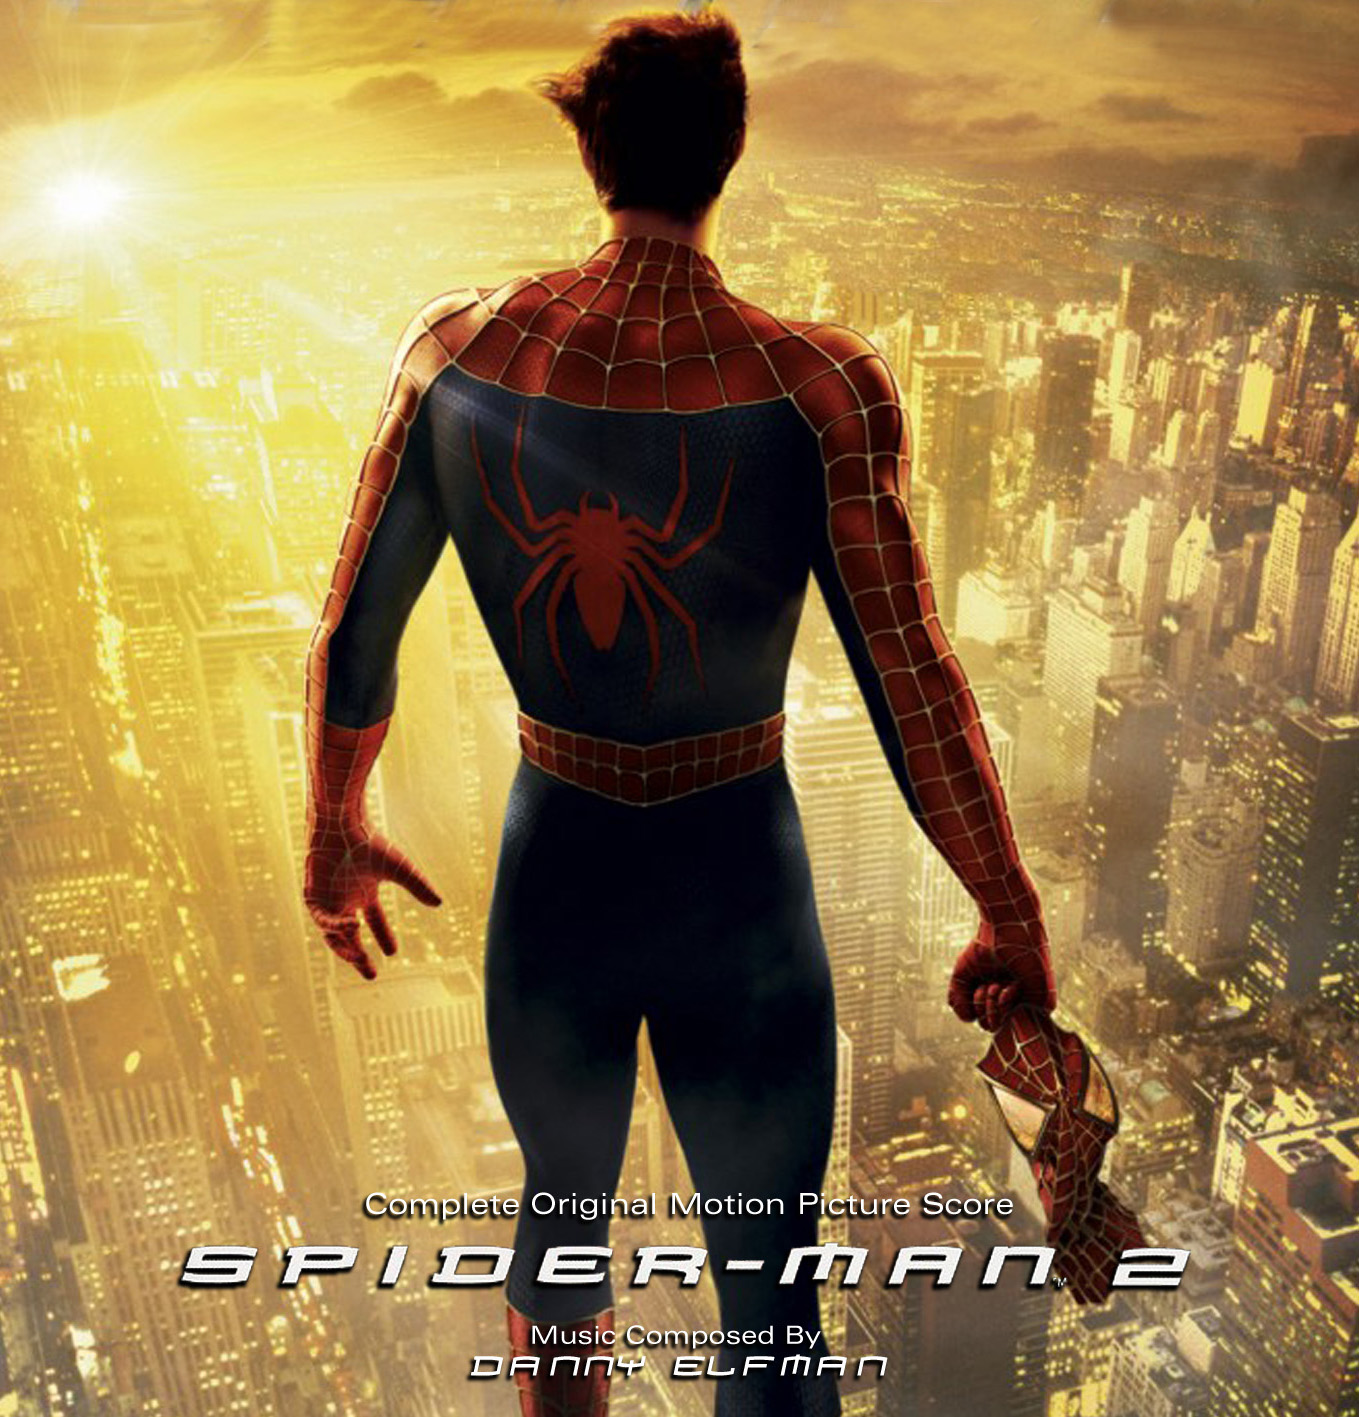 le blog de chief dundee:request: spider-man 2 complete score